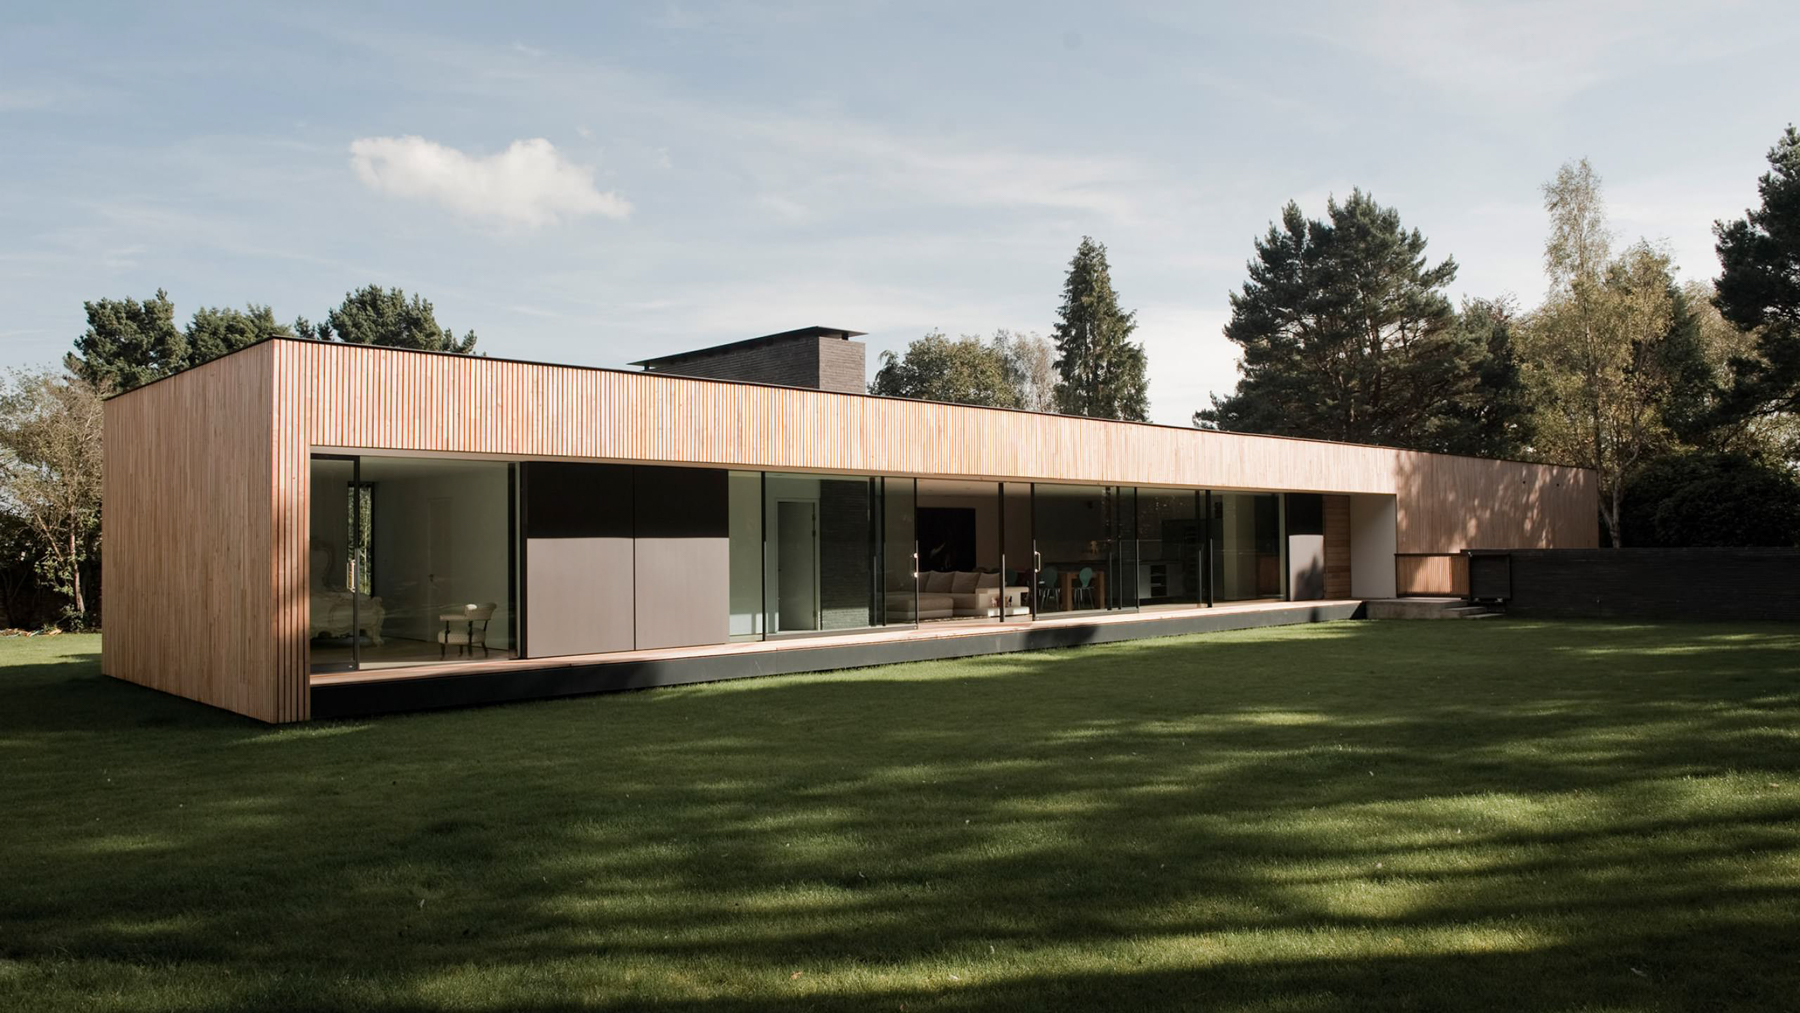 CroppedFocusedImage25601440-Strom-Architects-Watson-3.jpg